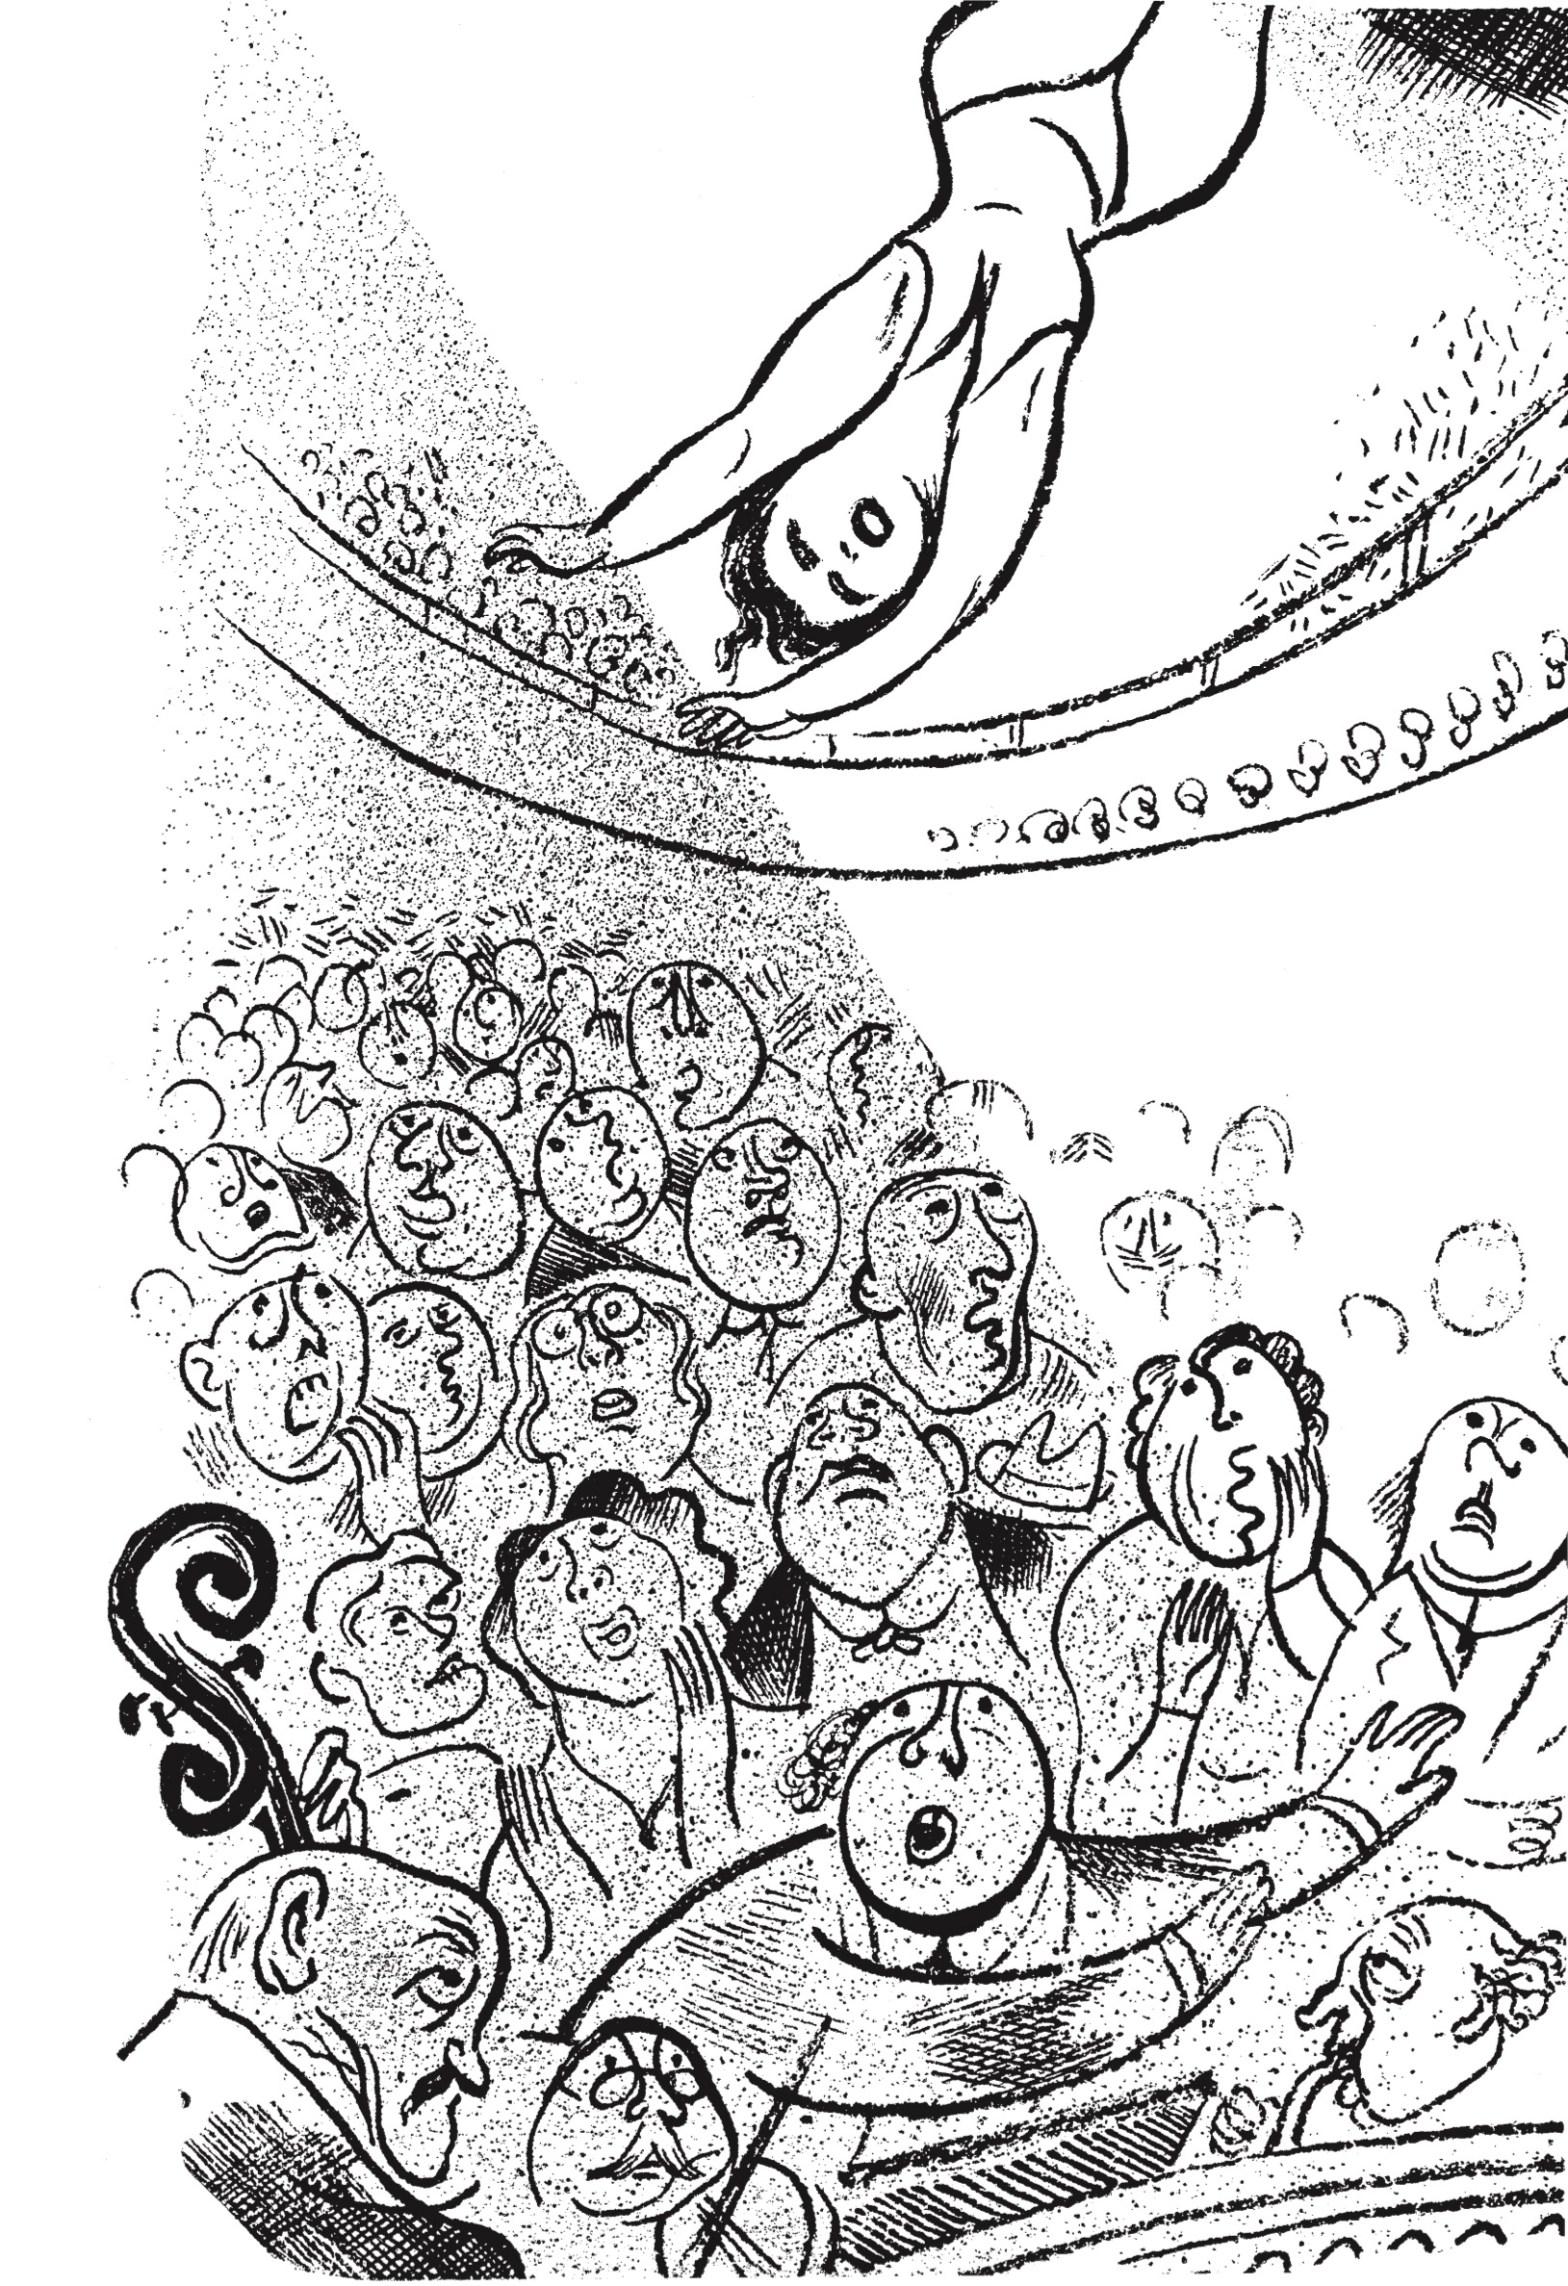 Thumbnail for The Daily Heller: Transcendent Comics